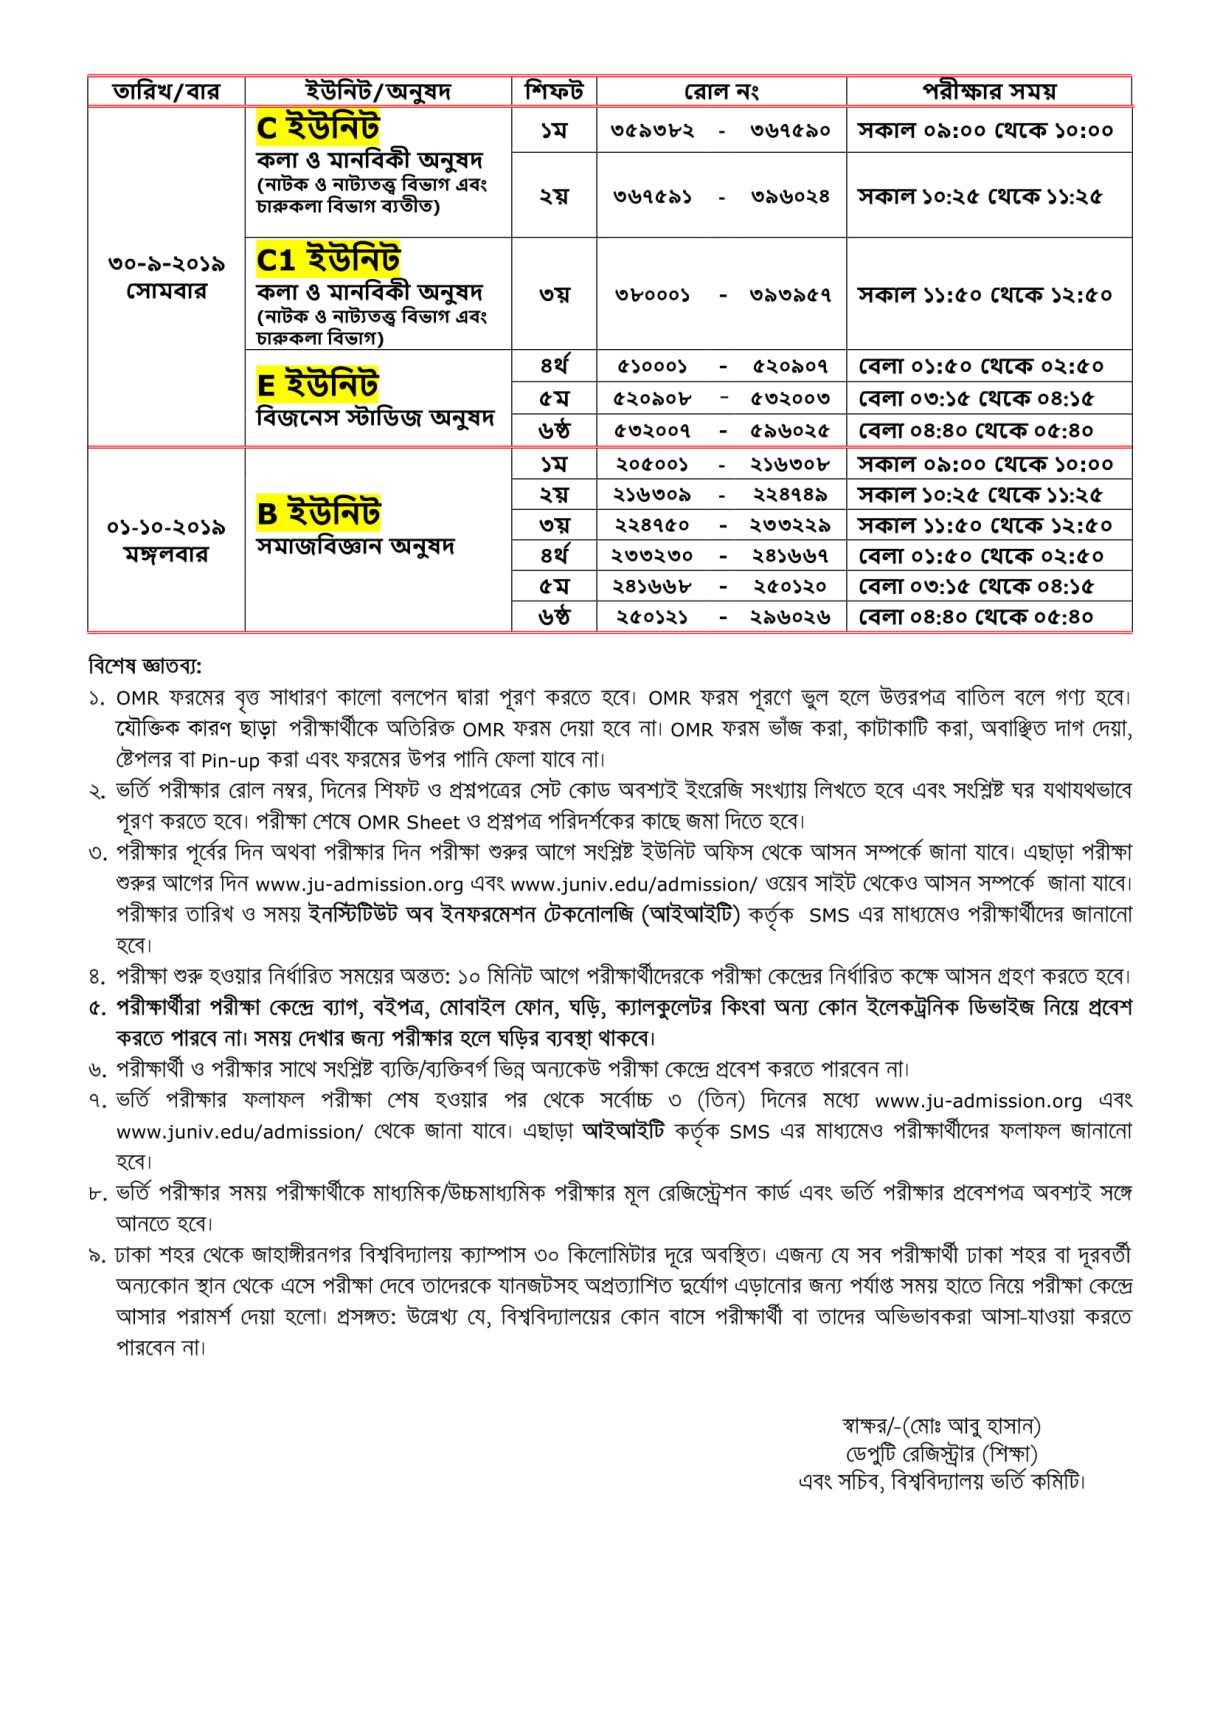 JU Admission Routine 2019-20-1